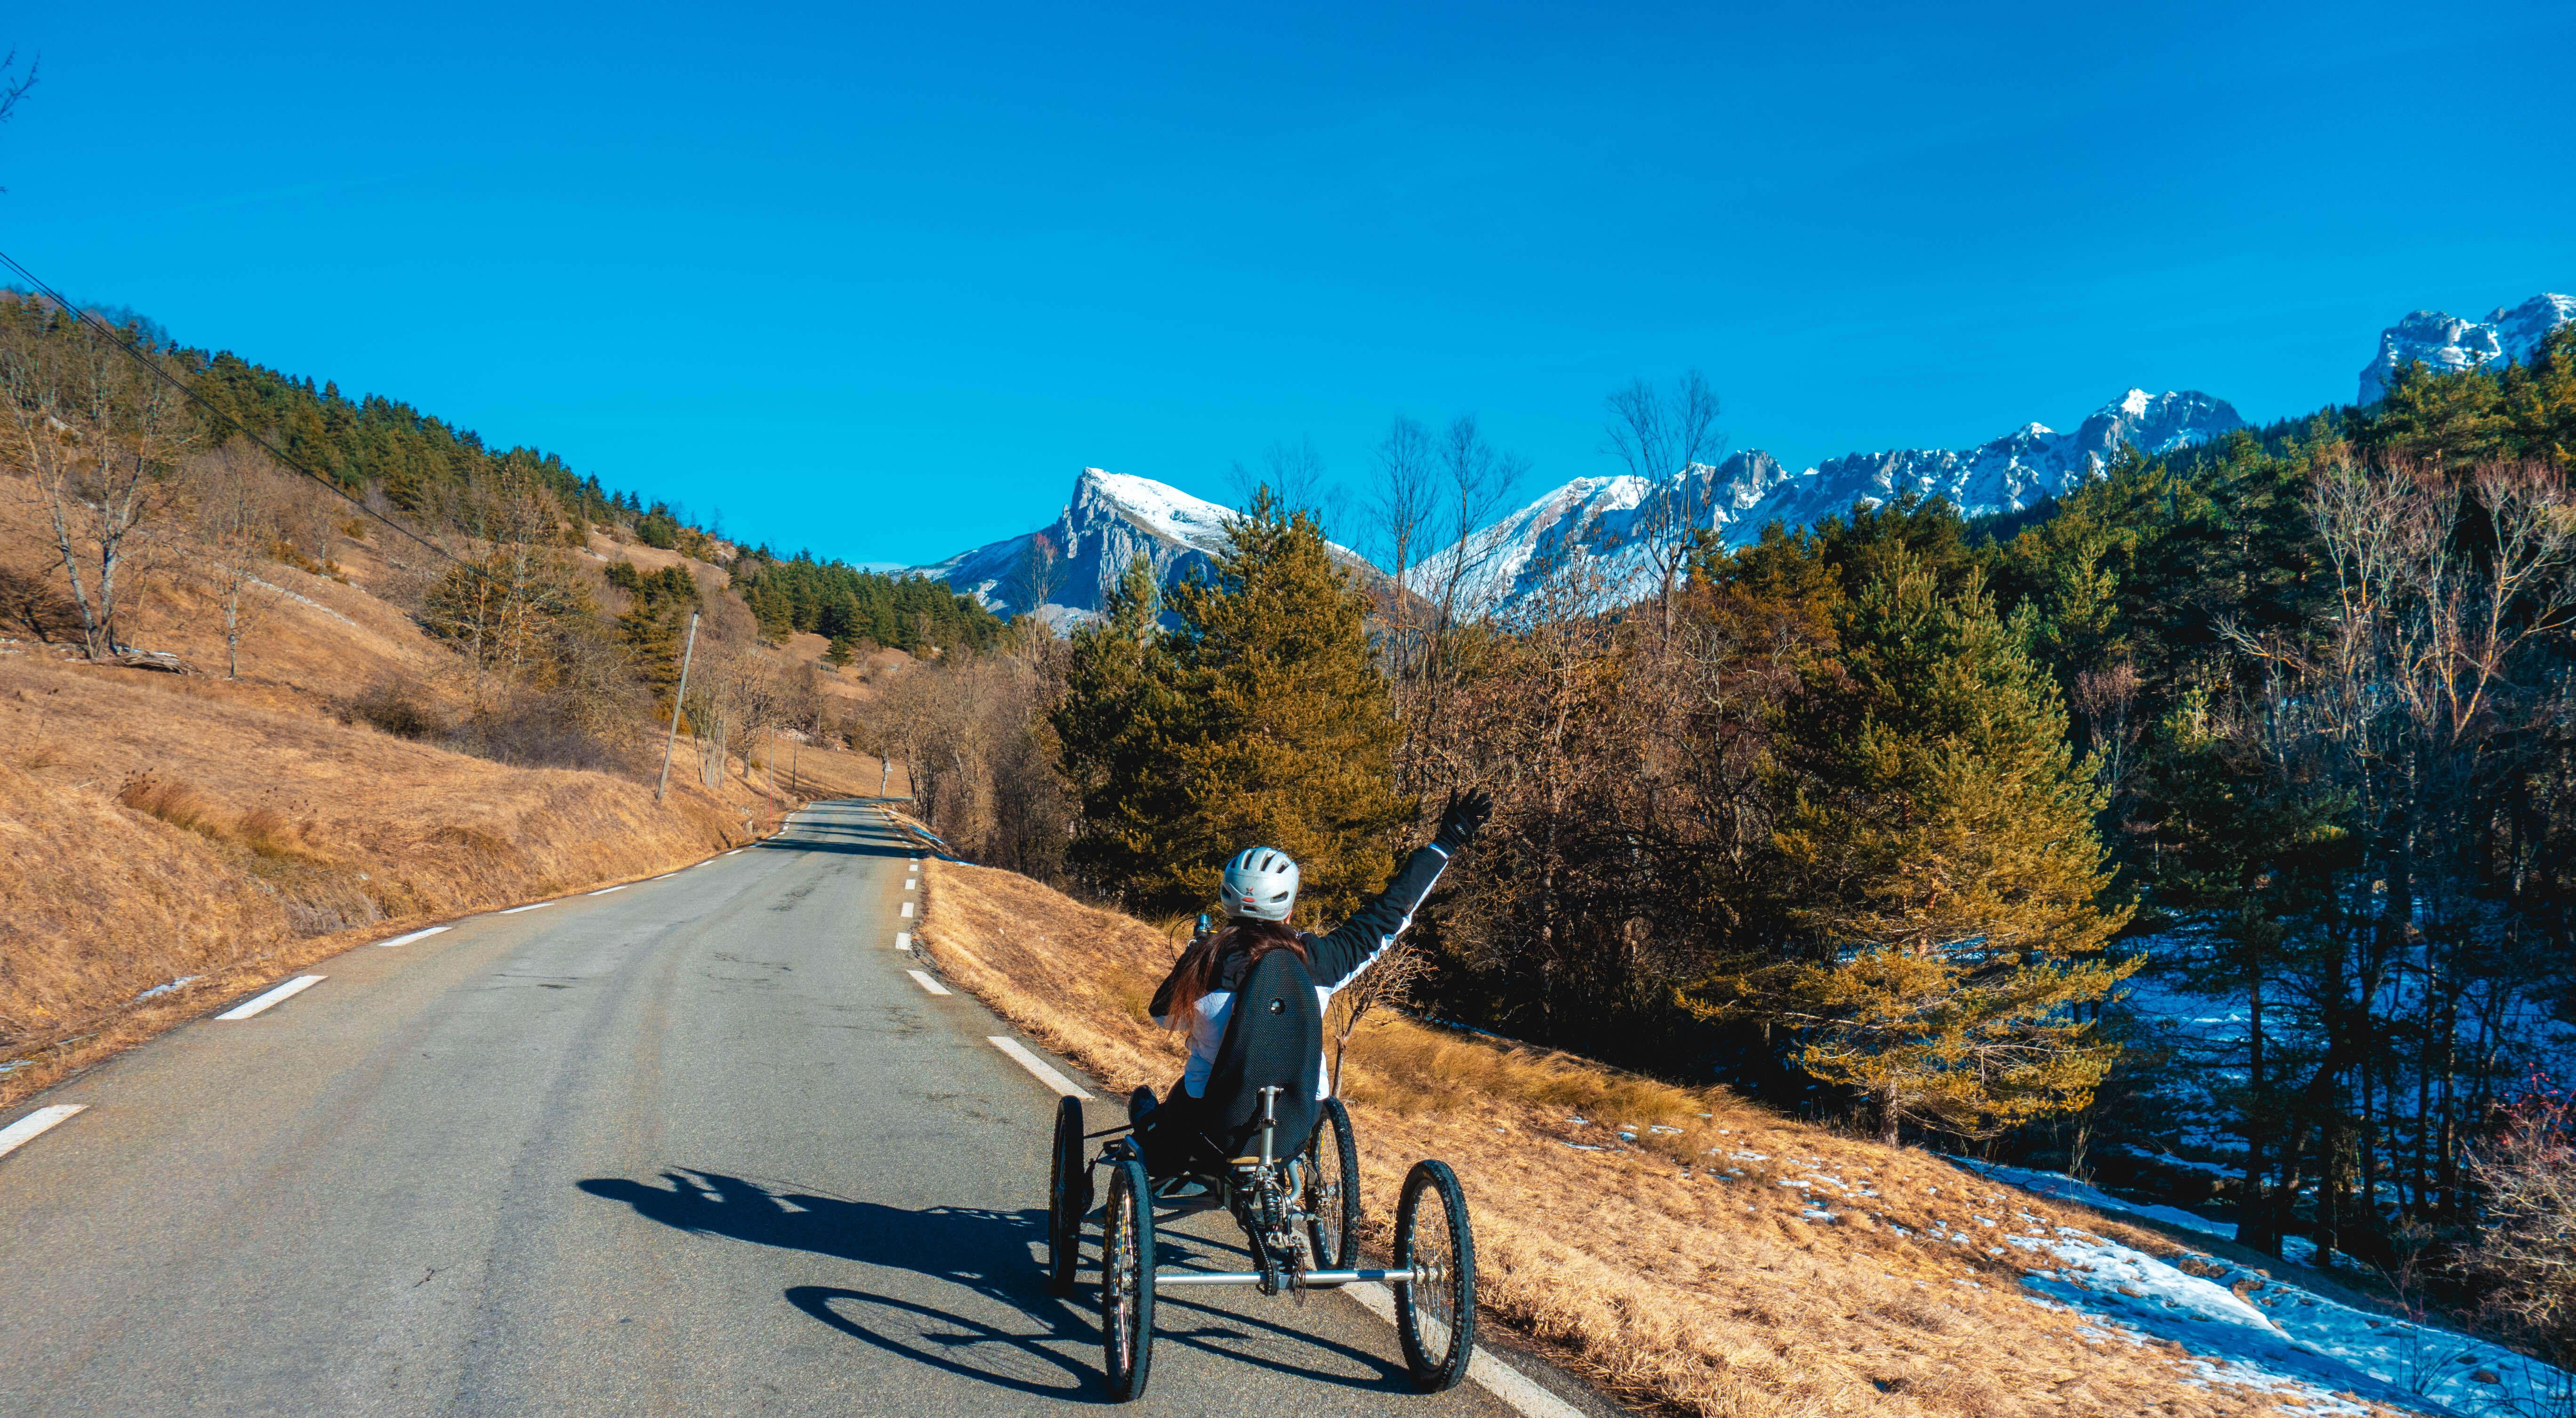 View Quad biking